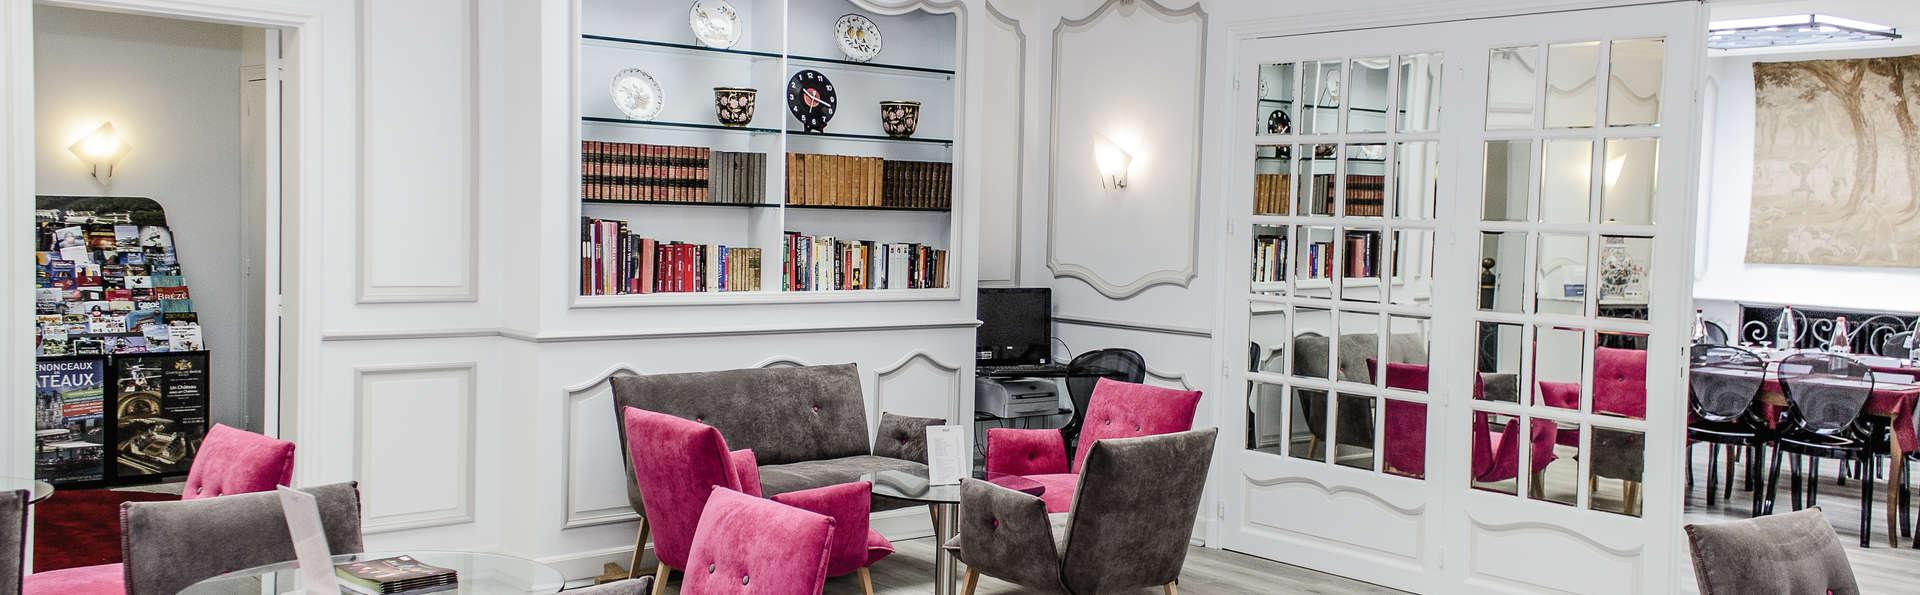 Hôtel KYRIAD Tours Centre - IMG_4325-Modifier-3.jpg